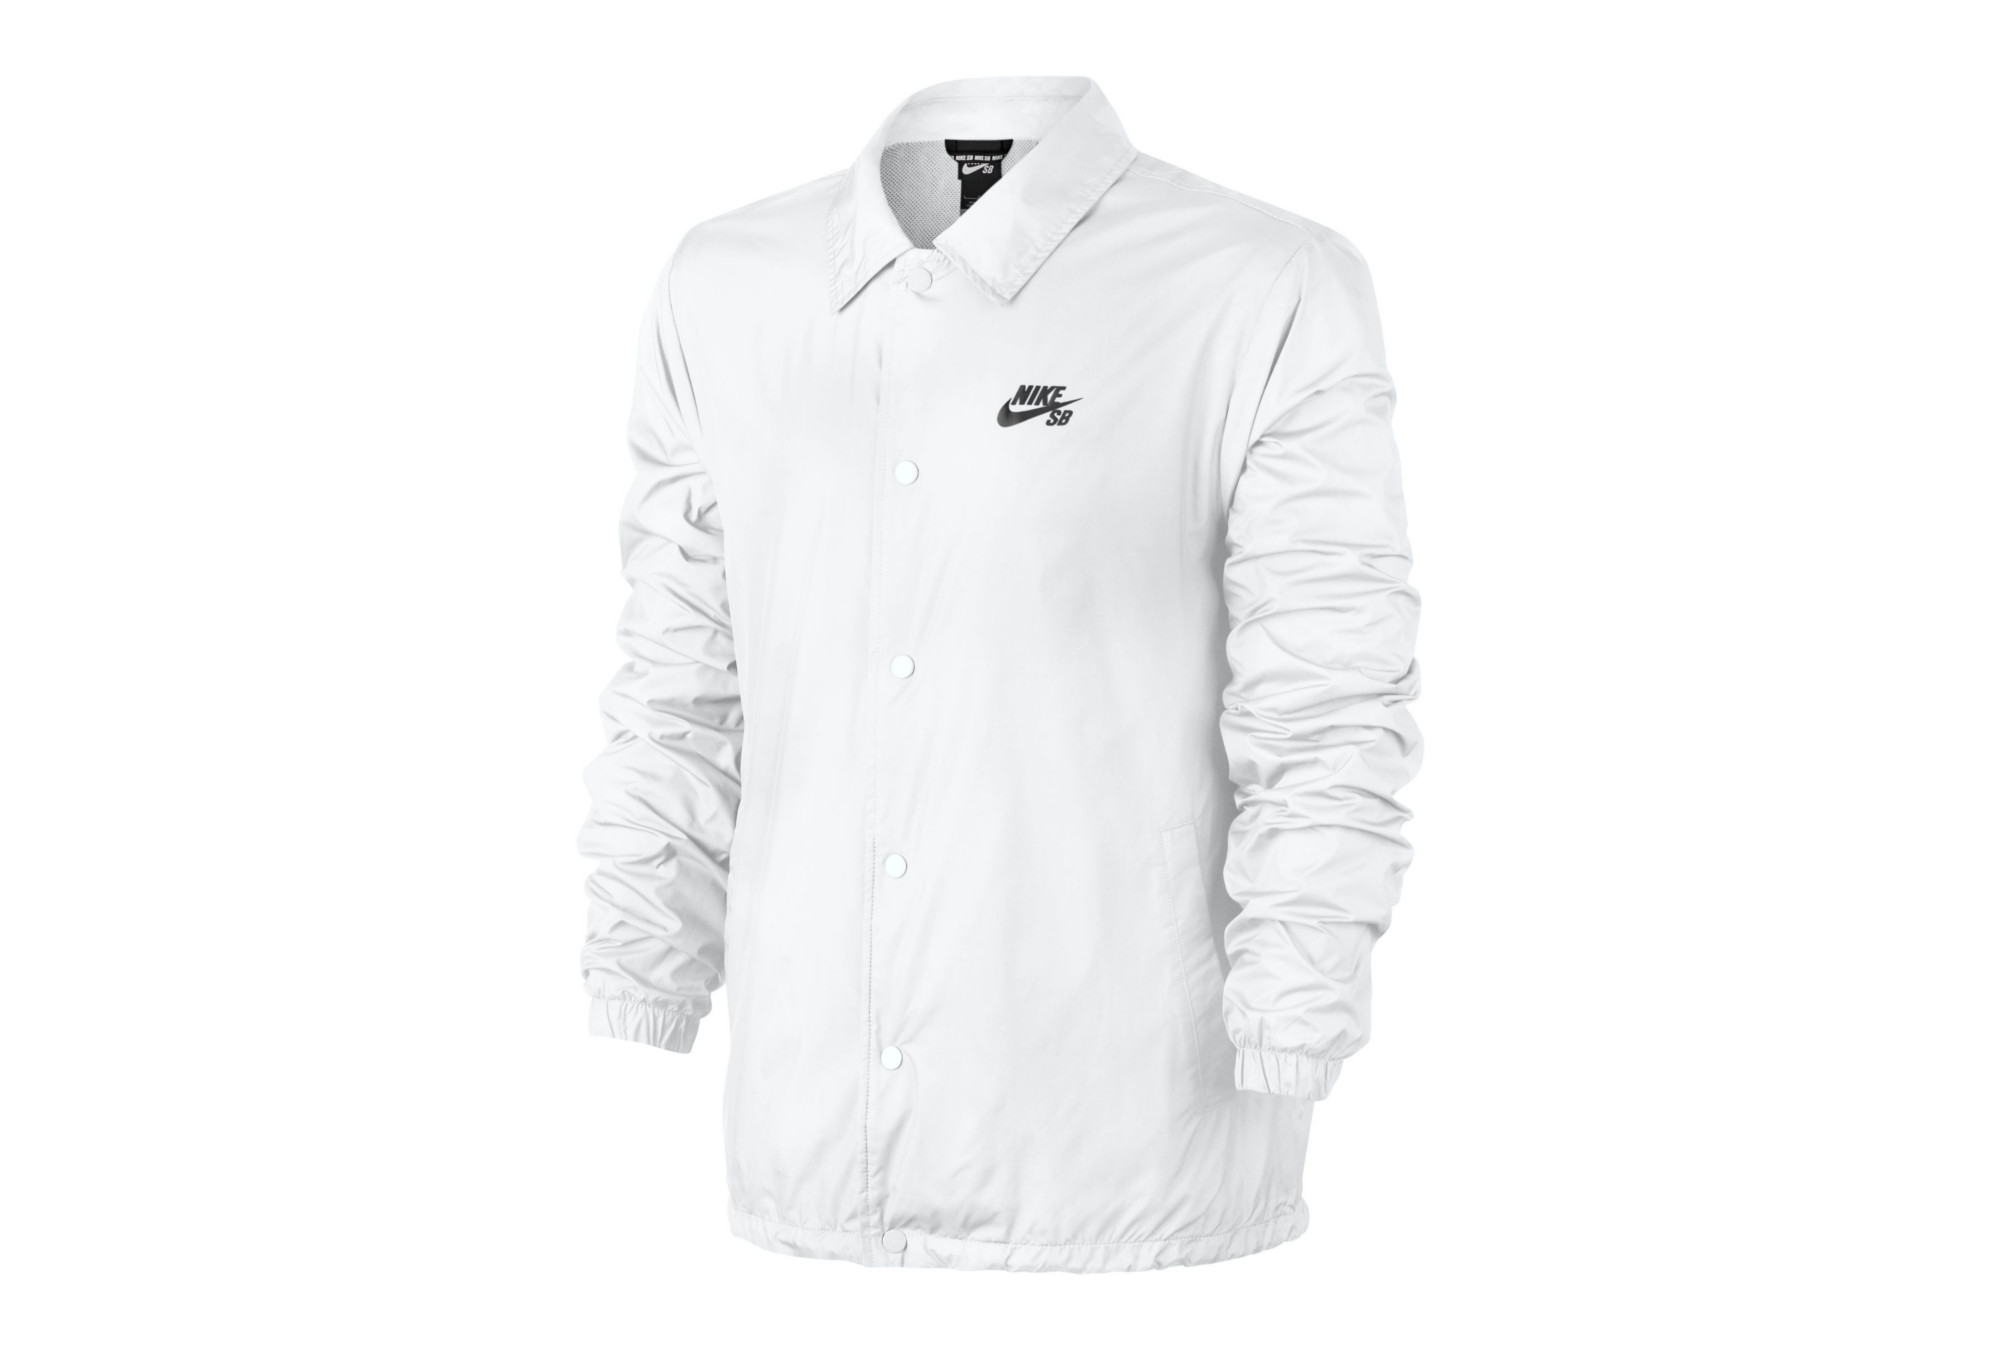 Soldes > veste nike sb blanche > en stock